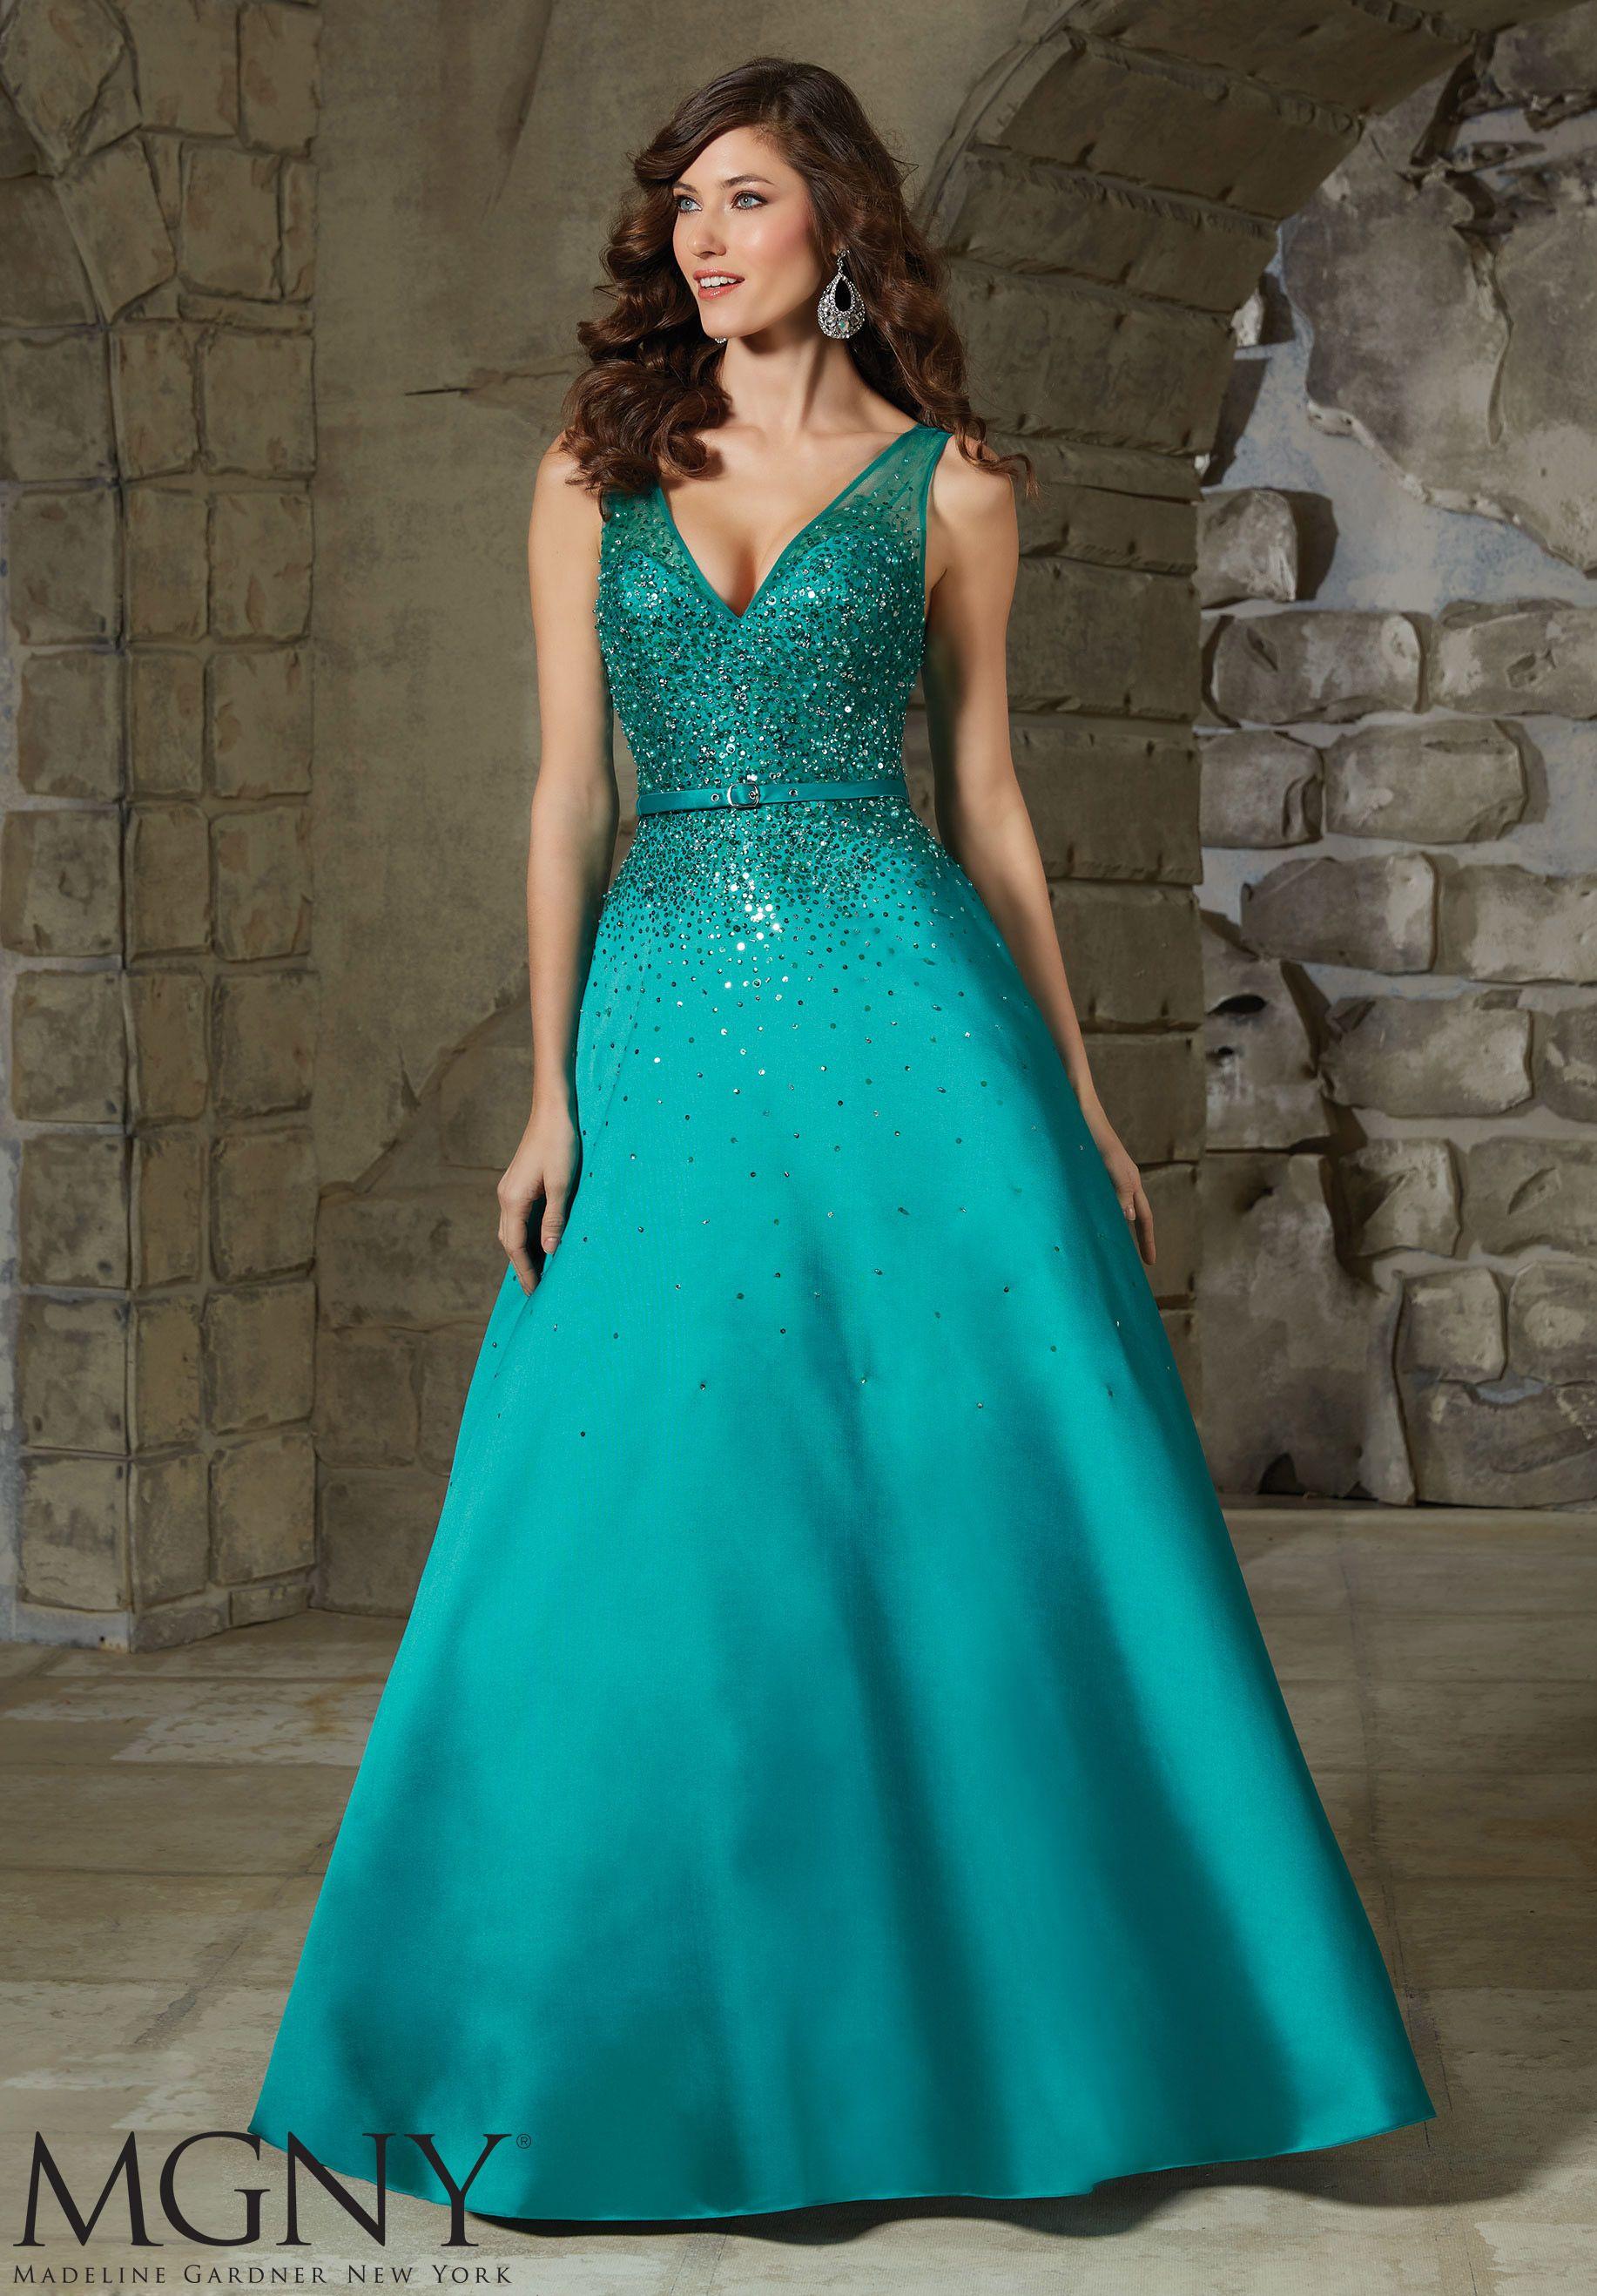 Crystal Beading on Larissa SatinEvening Gown | Clothing Ideas ...